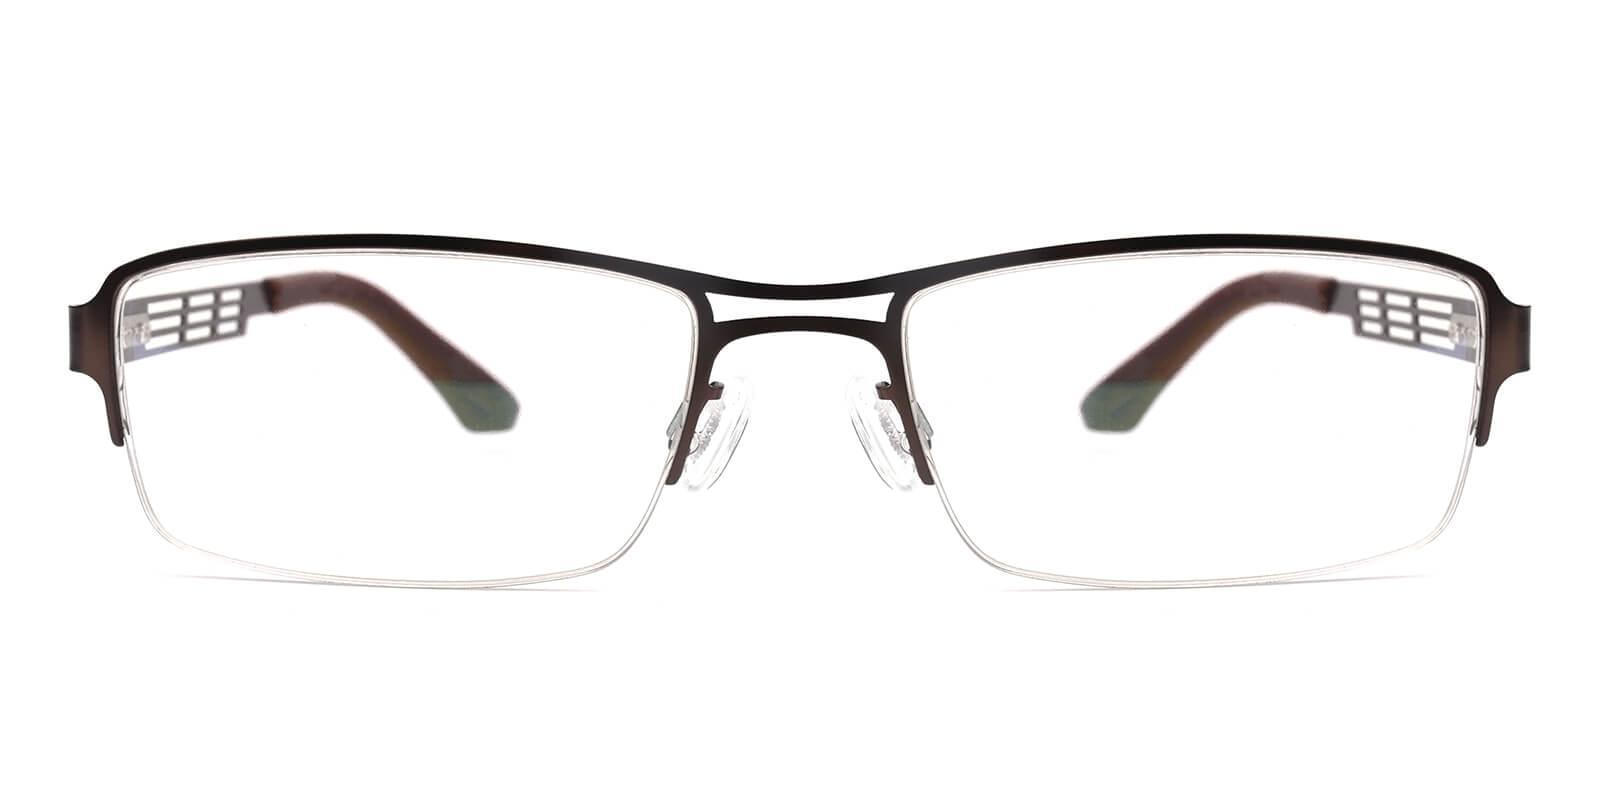 Carel-Brown-Rectangle-Metal-Eyeglasses-additional2